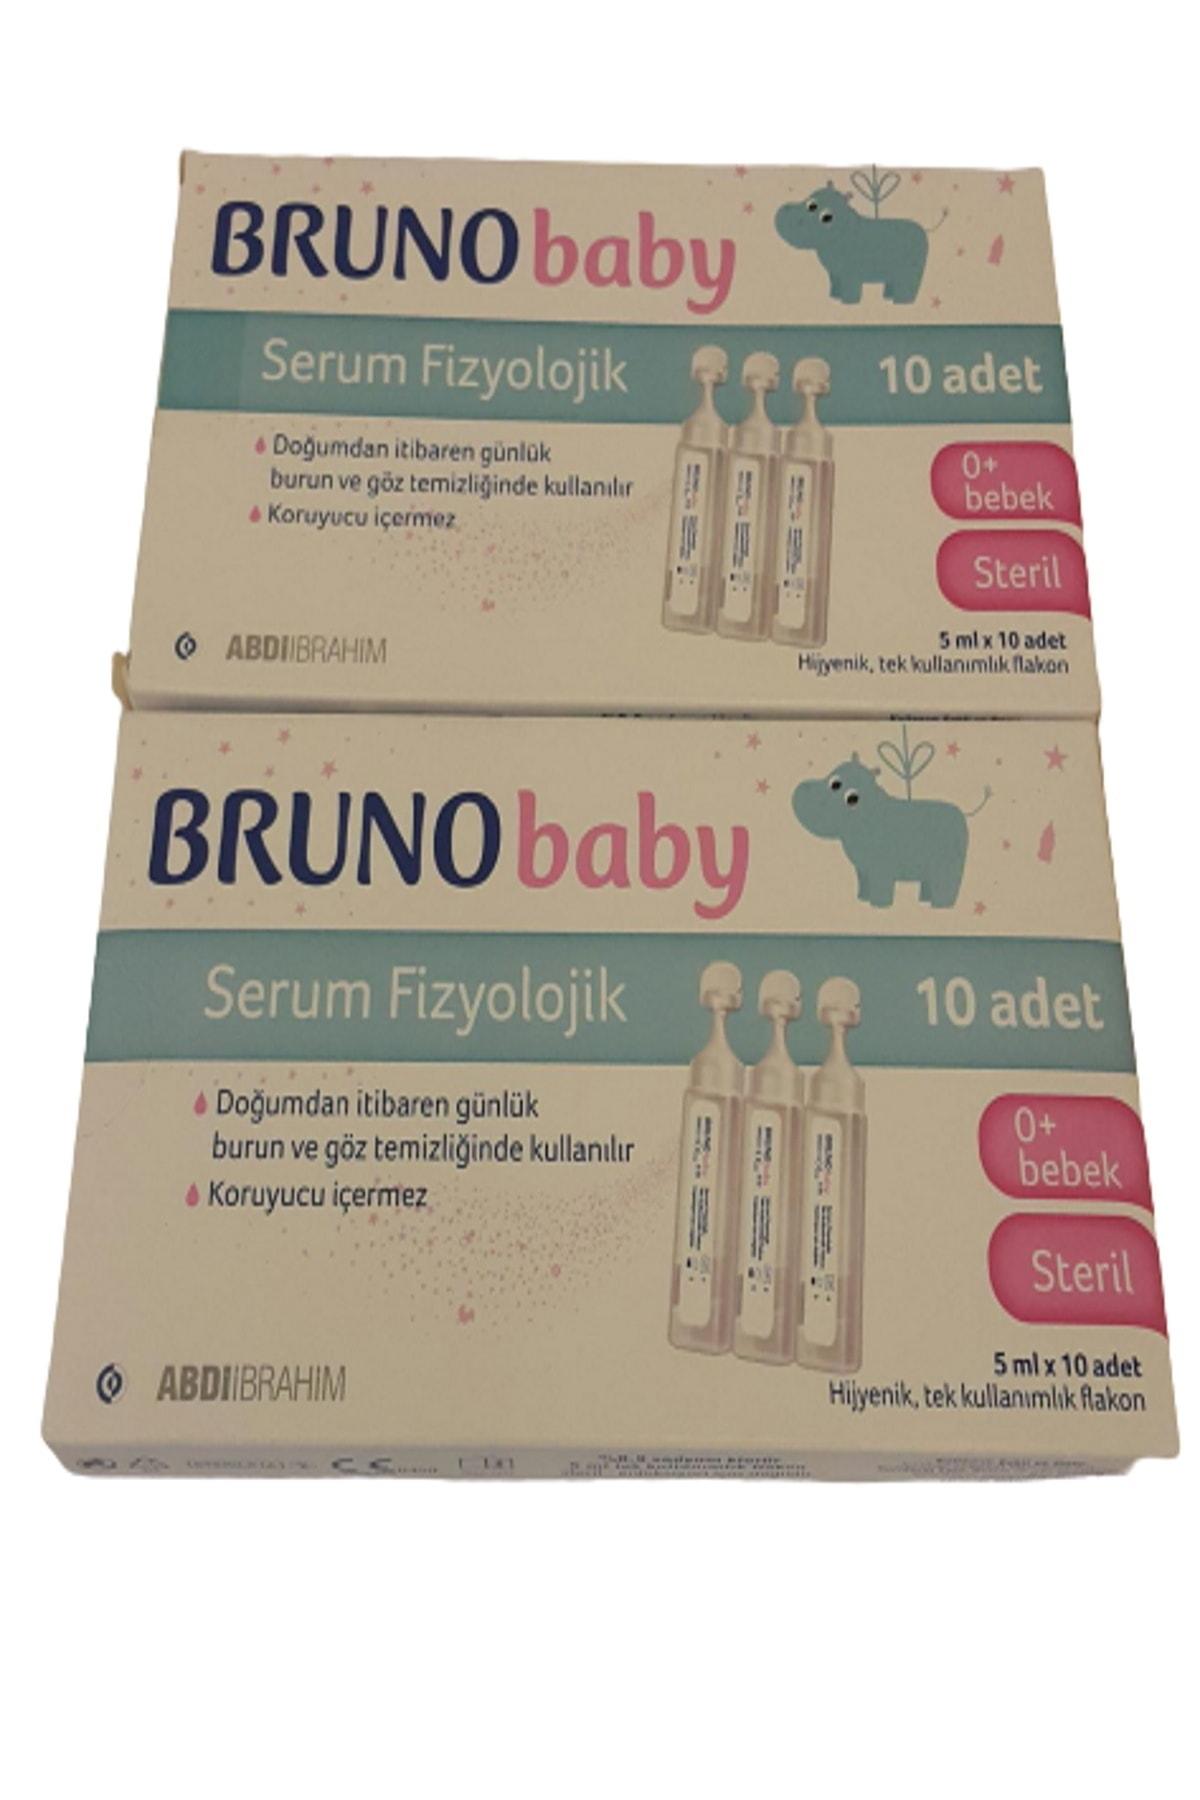 Bruno Baby Fizyolojik Serum Damla 5 Ml X 10 Flakon 2 Kutu 1